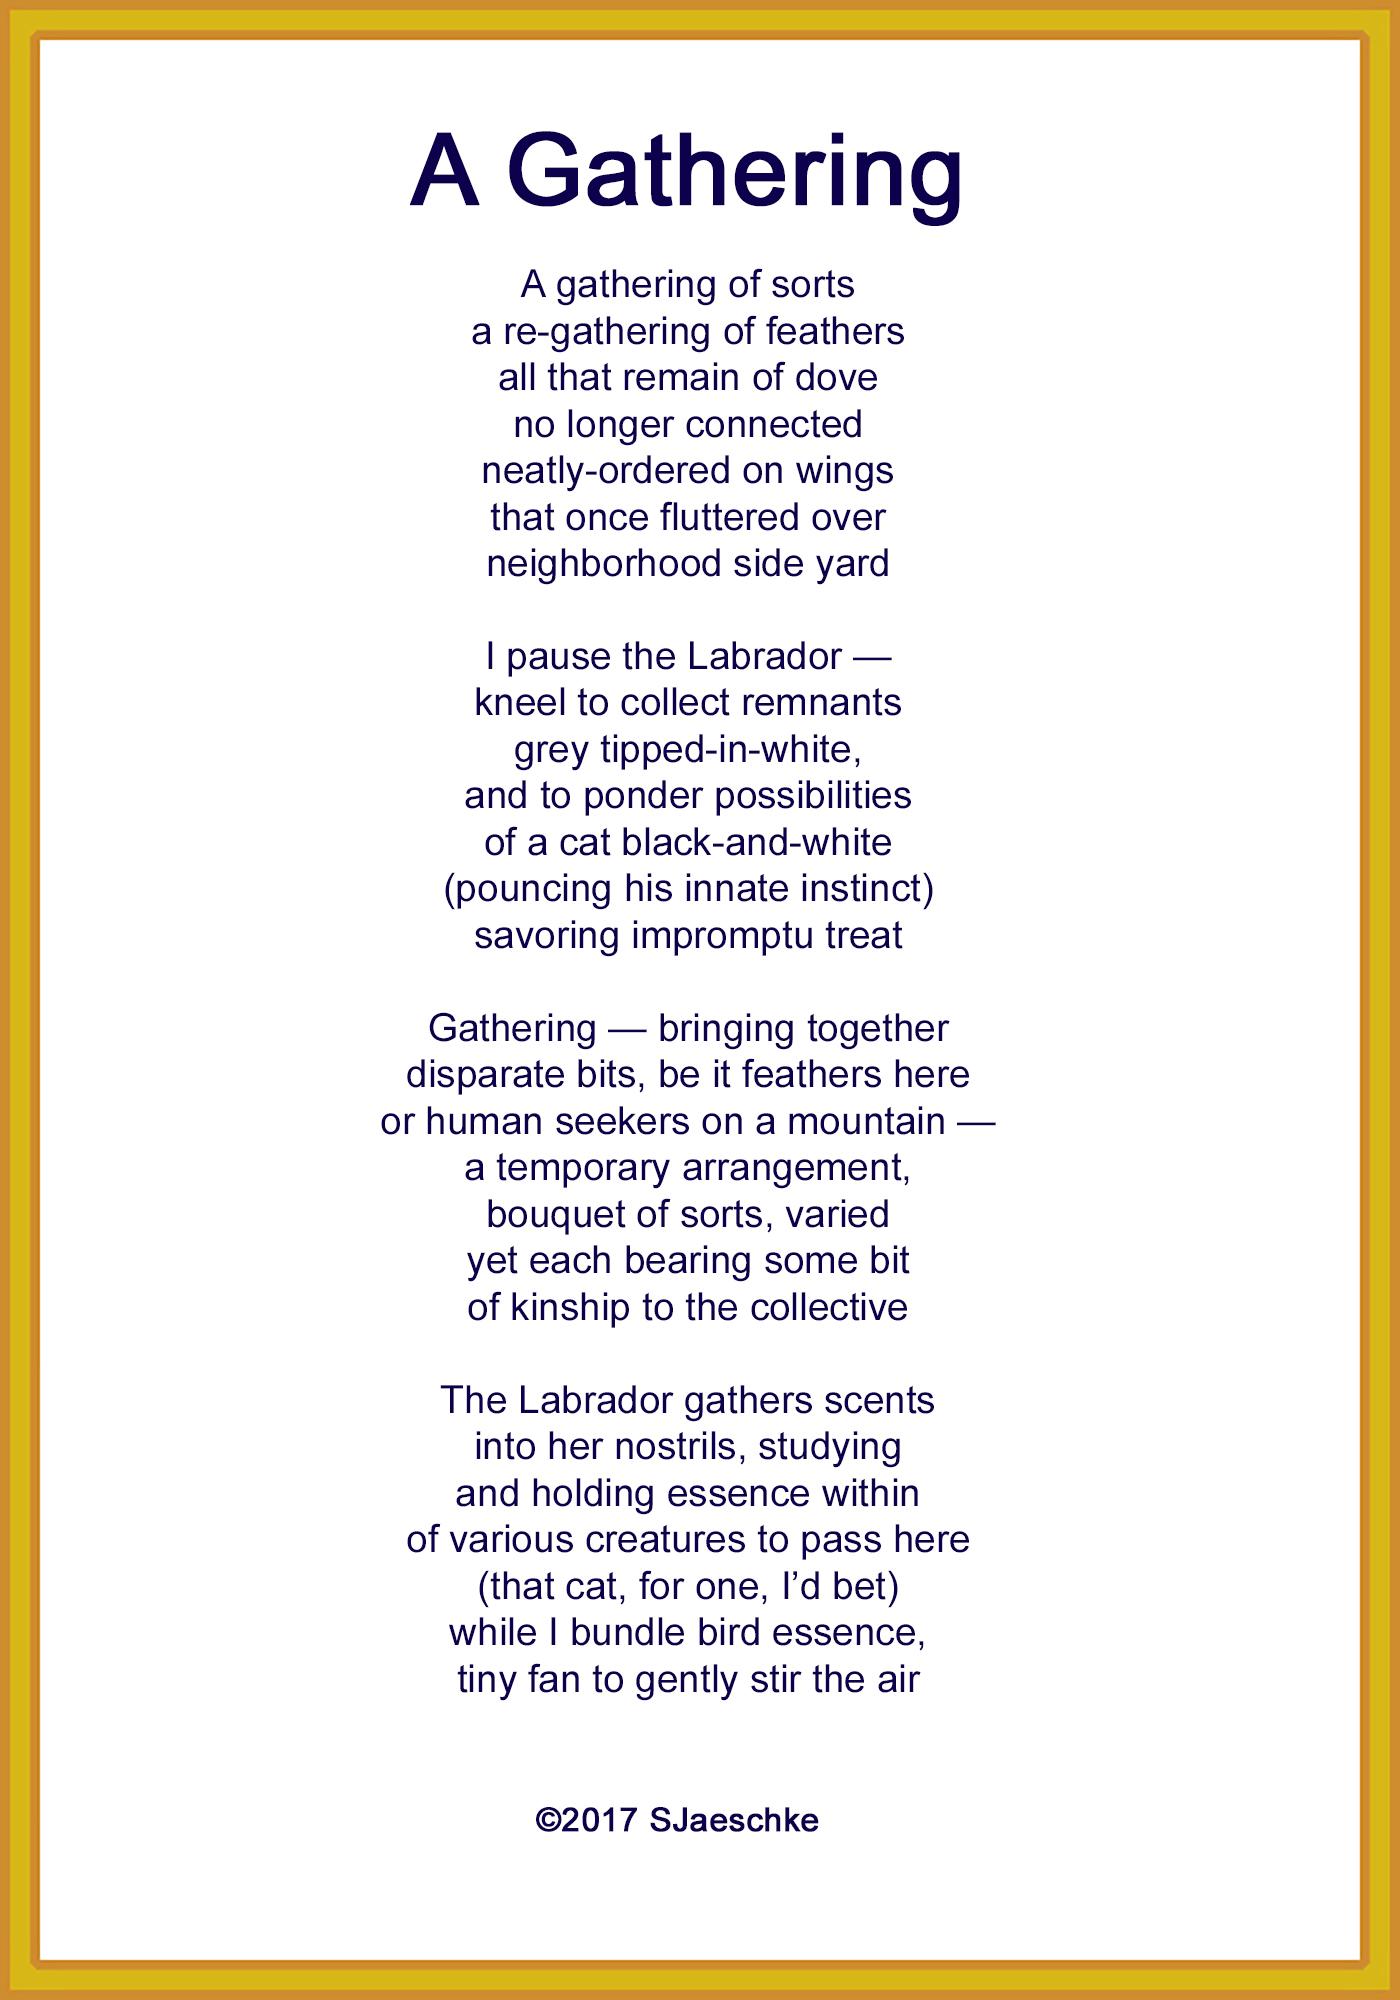 Post_2017-11-14_Poem_Gathering